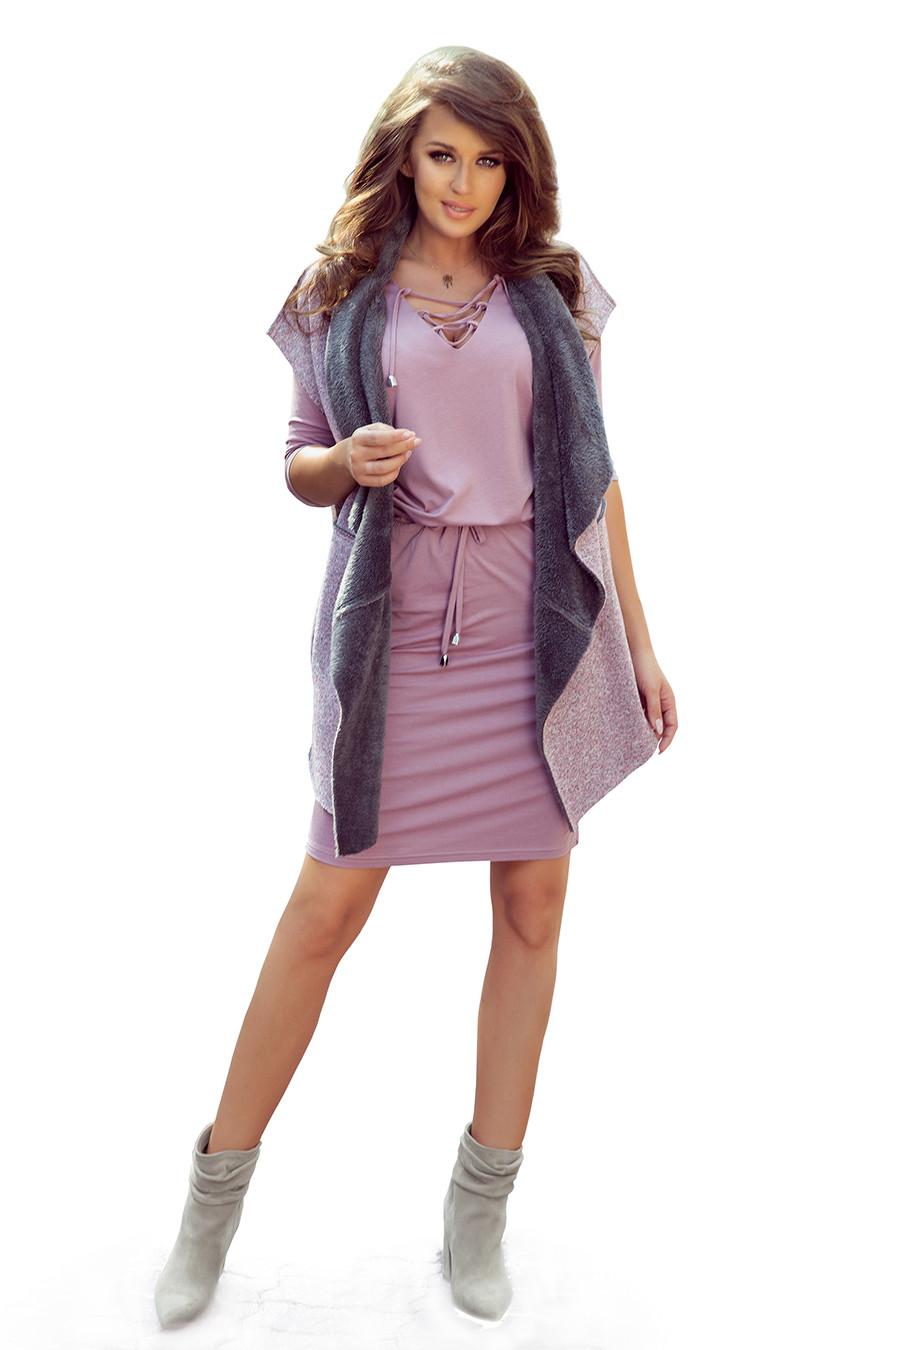 NUMOCO Woman's Vest 276-1 Pink/Grey